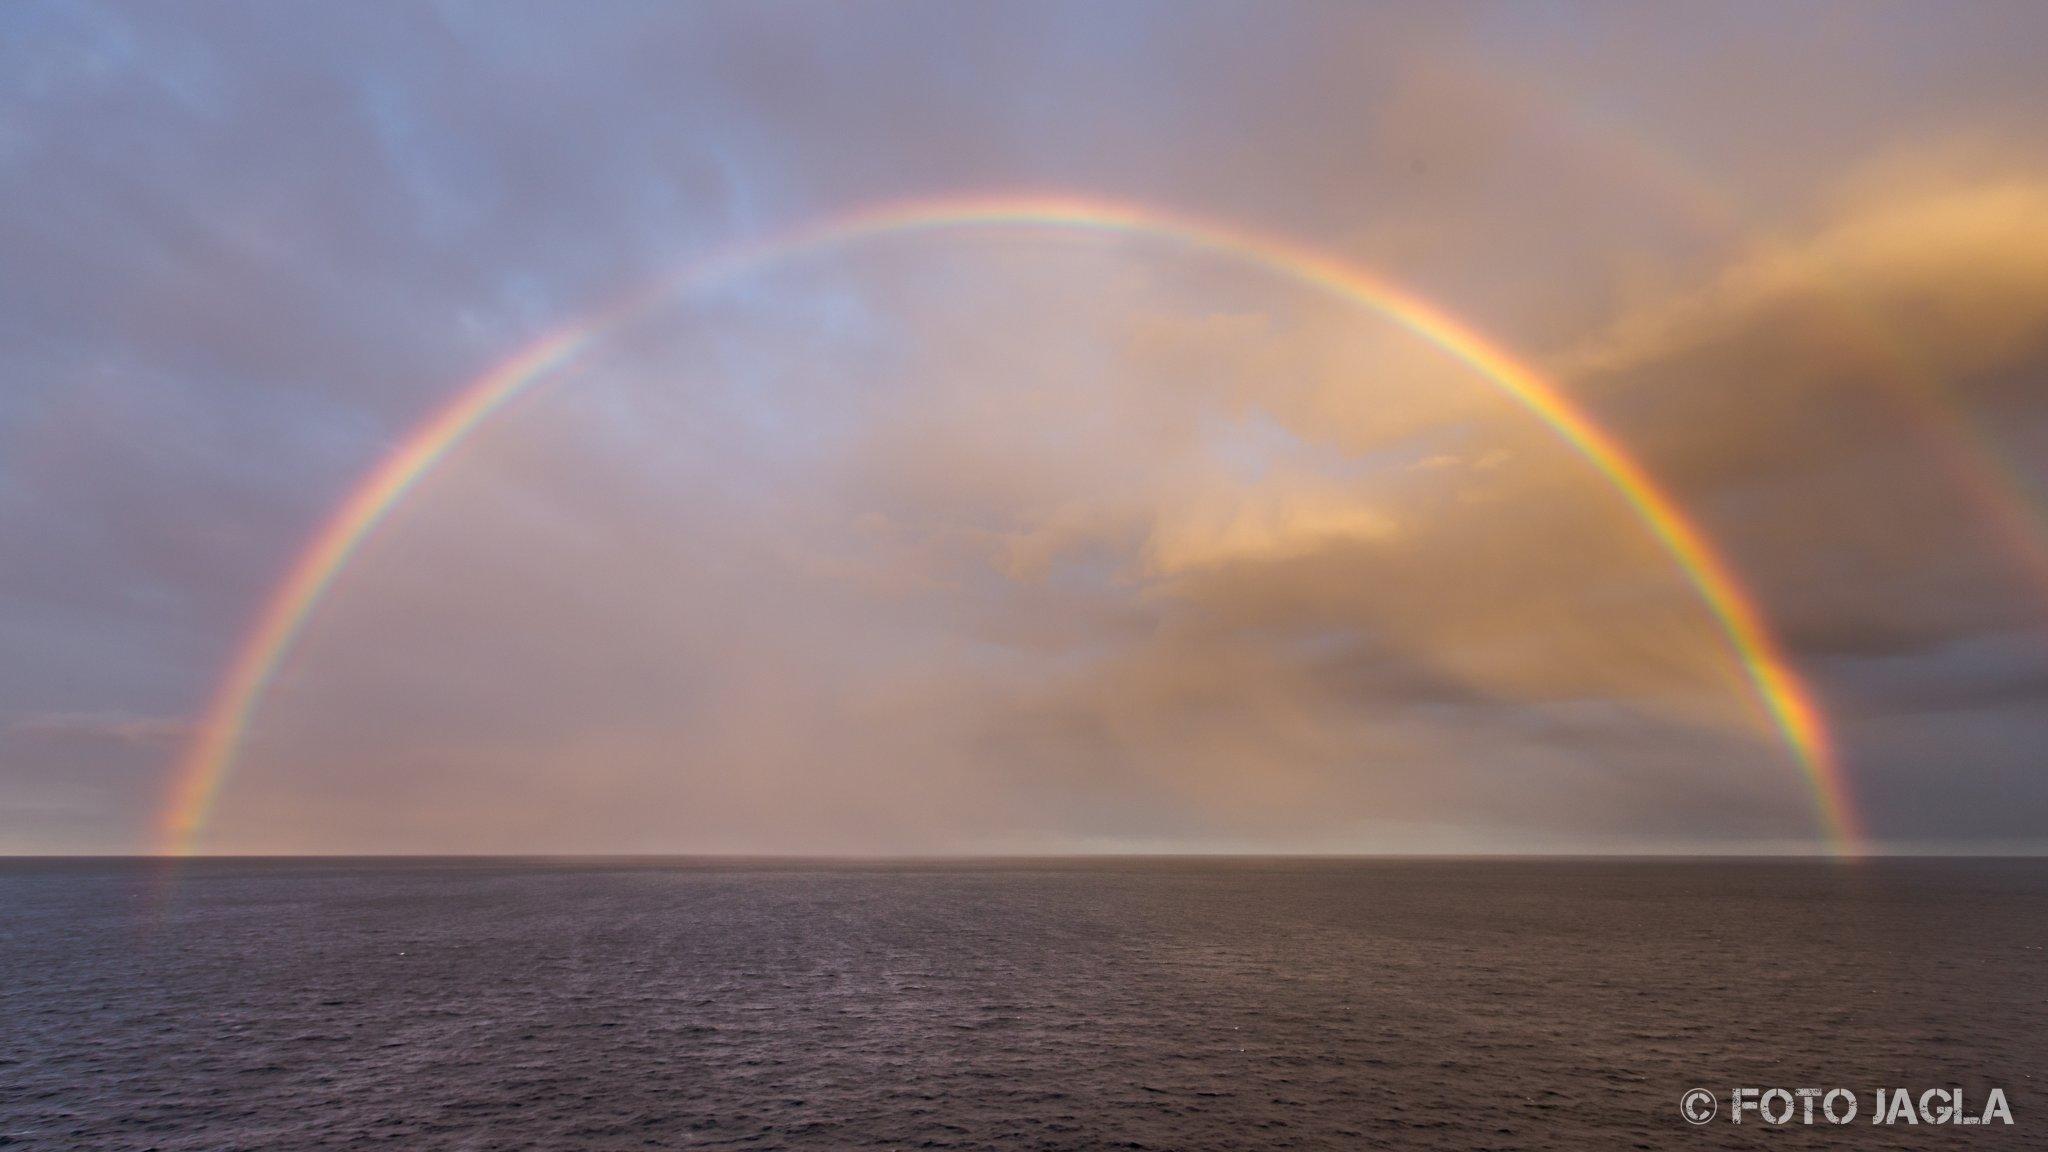 70000 Tons Of Metal 2017 Regenbogen beim Auslaufen des Hafens in Fort Lauderdale